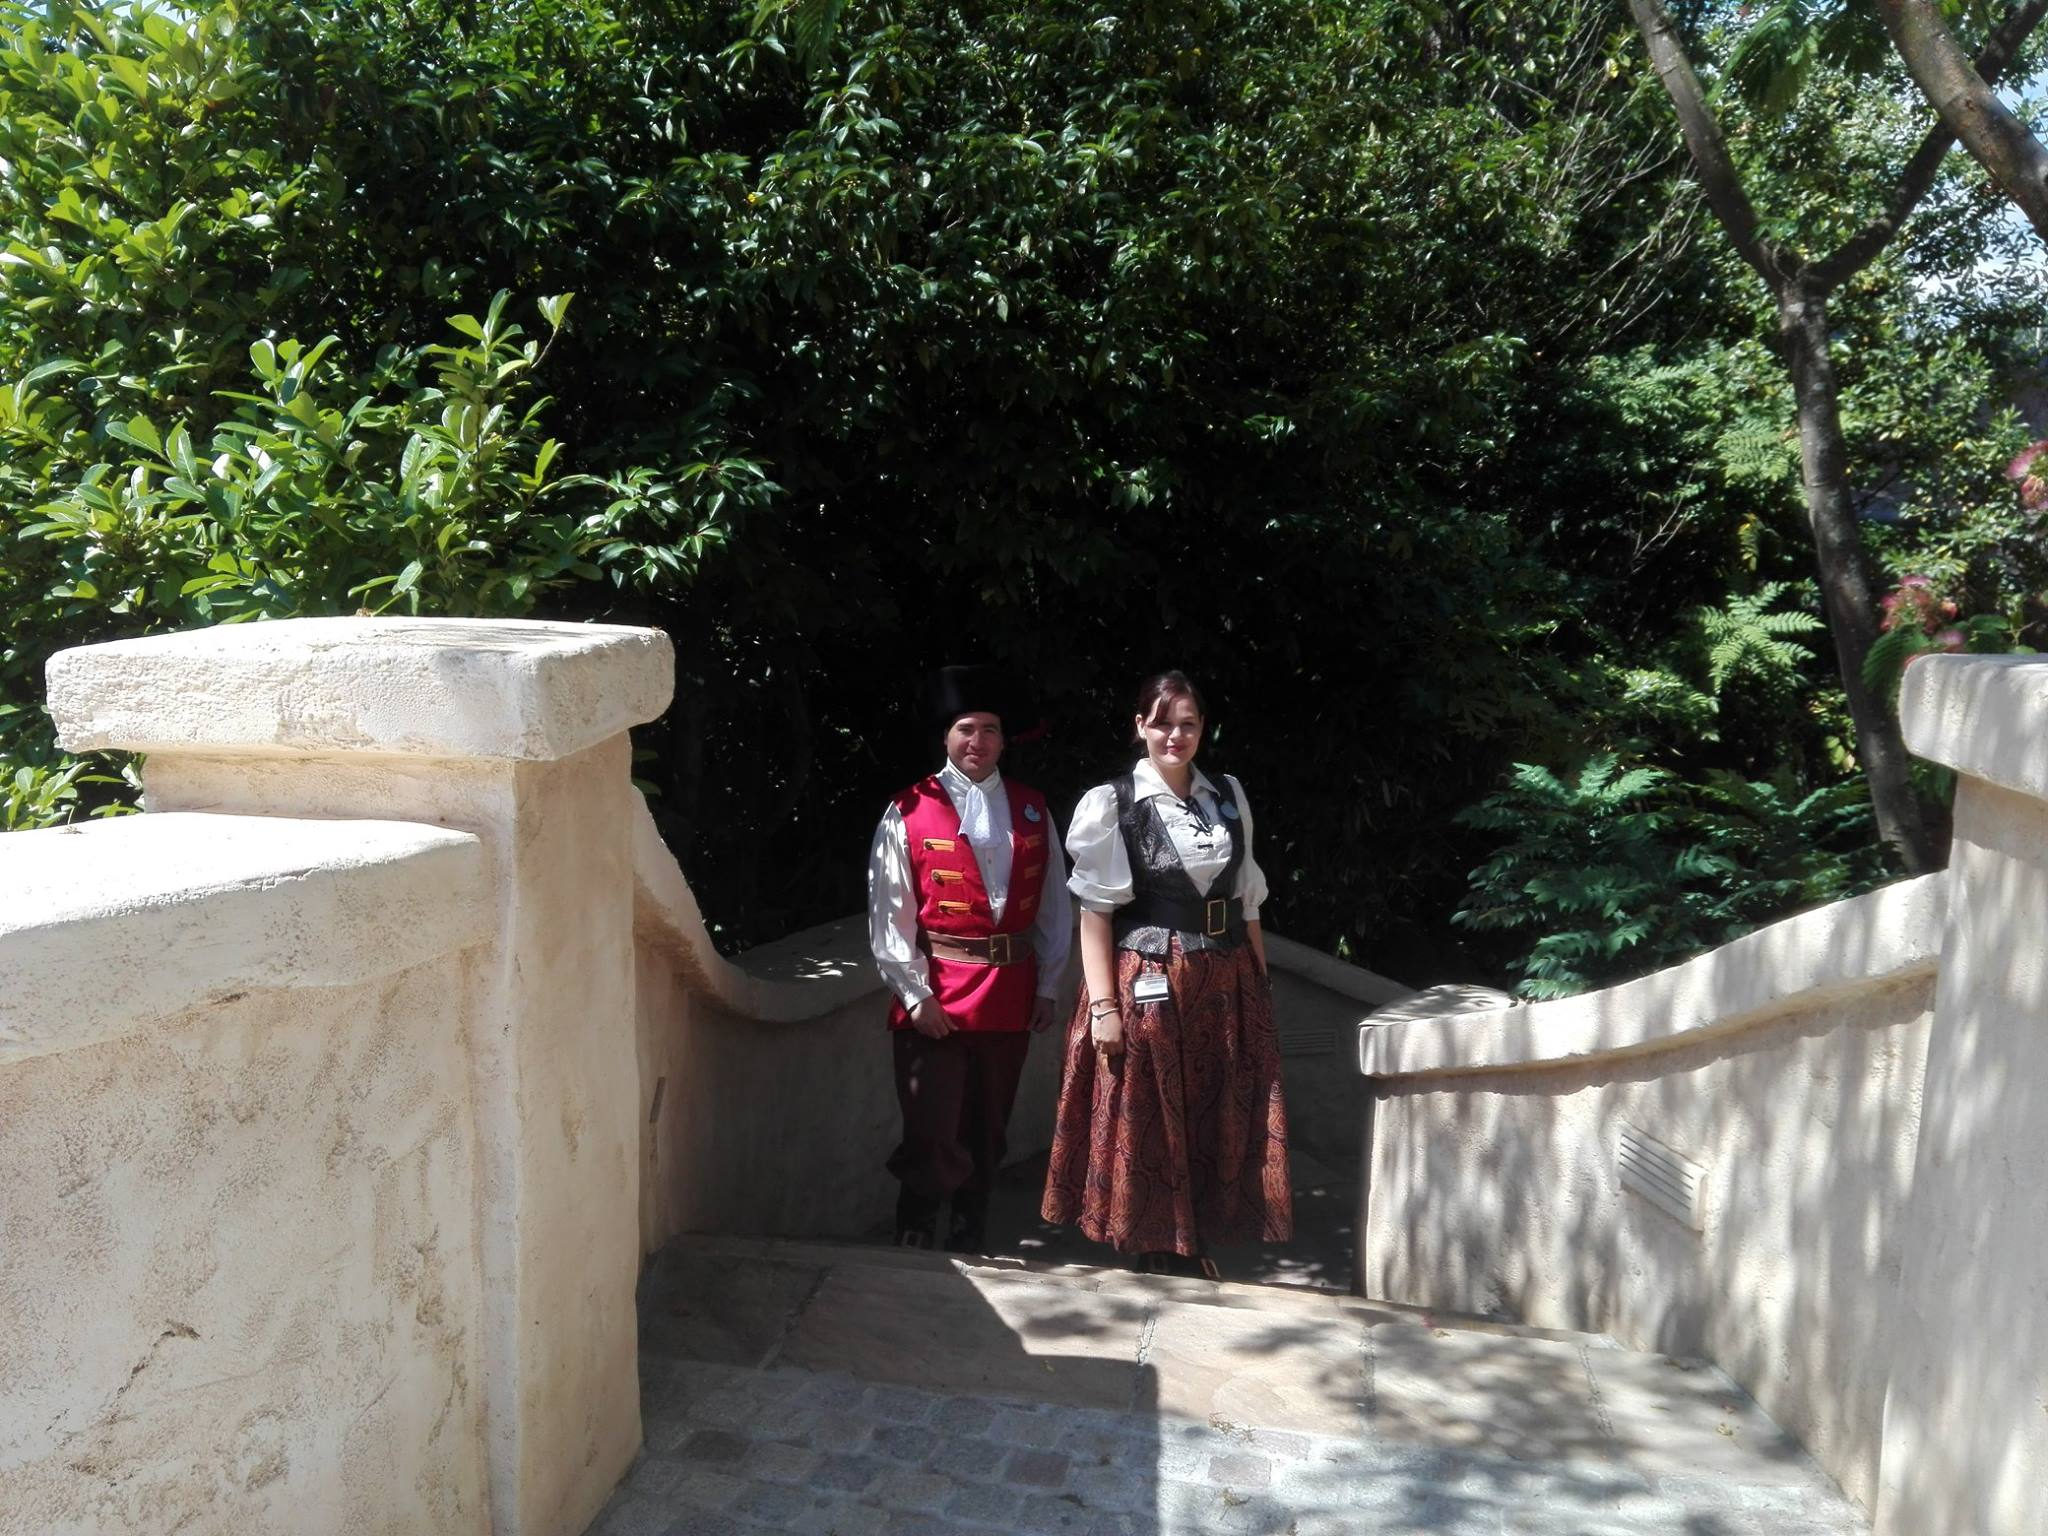 Zone réaménagée à Pirates des Caraïbes - Disneyland Paris